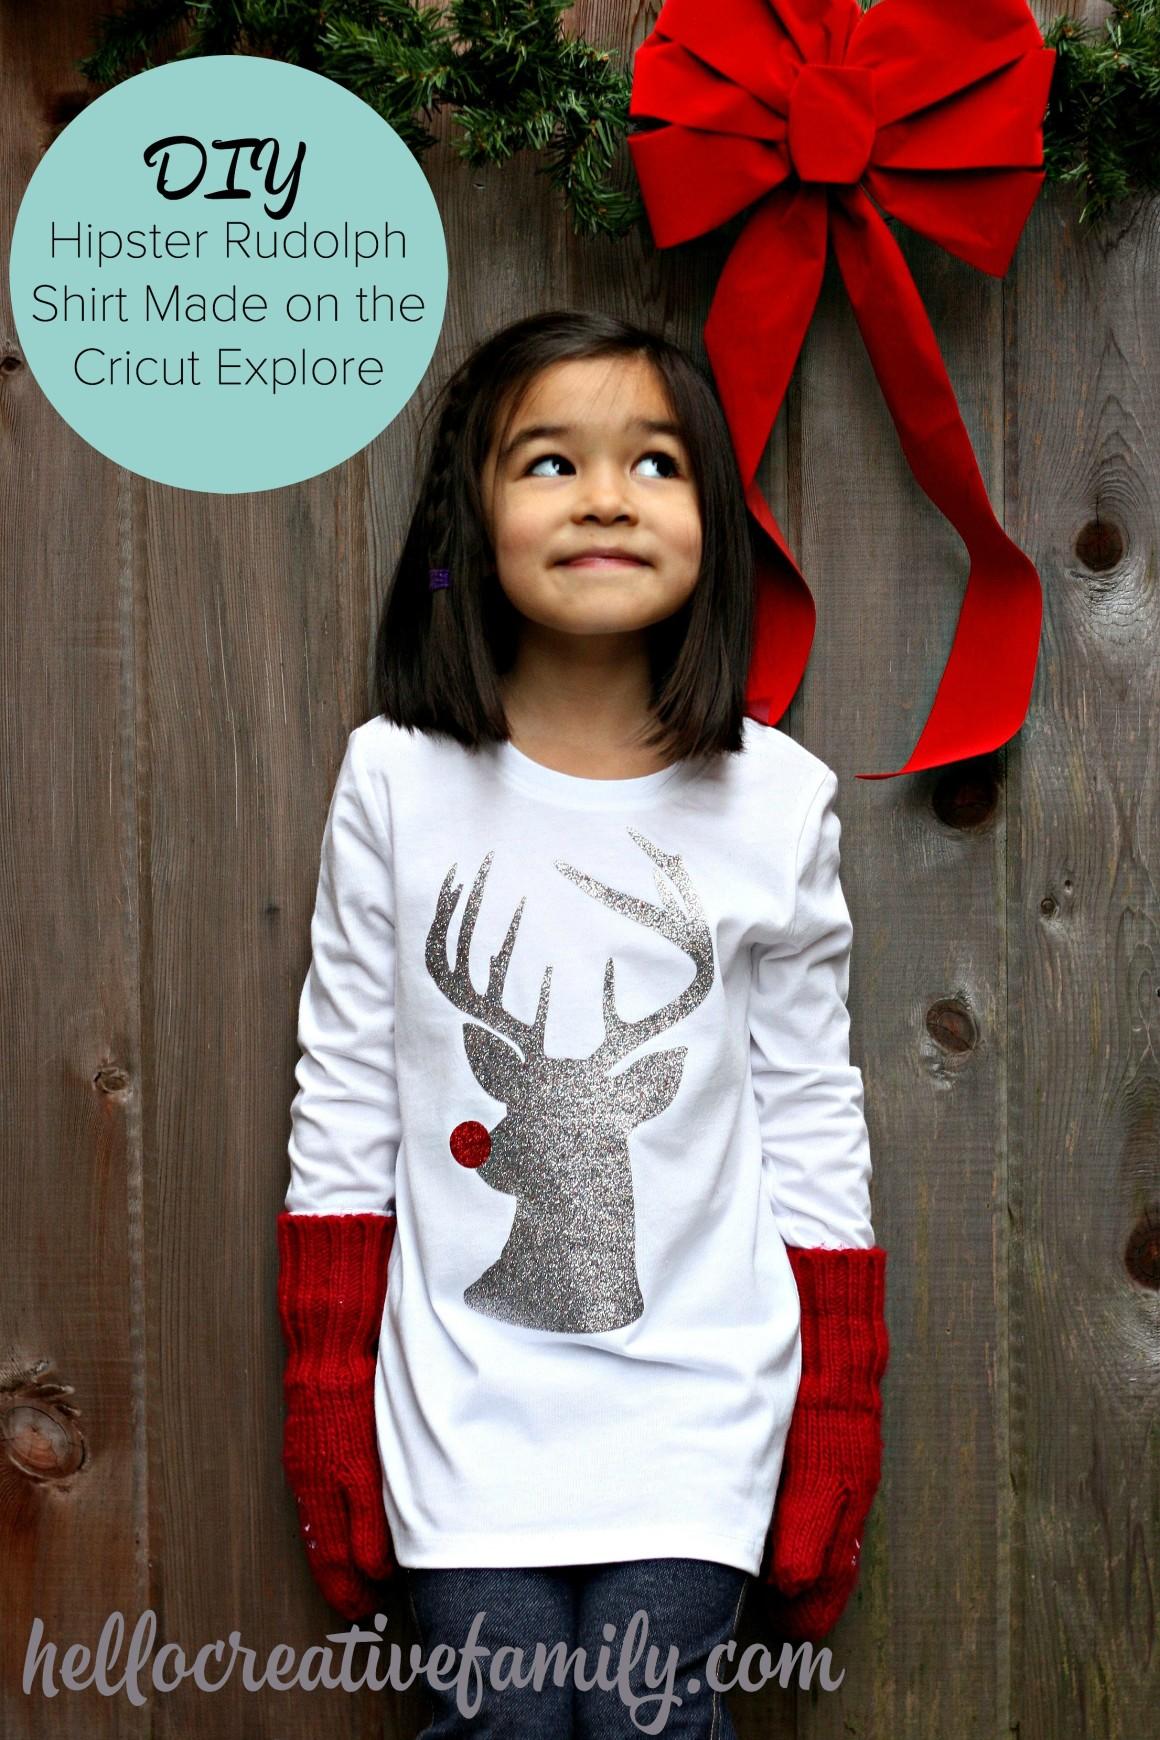 Diy Superhero Shirts Made With The Cricut Explore Hello Creative